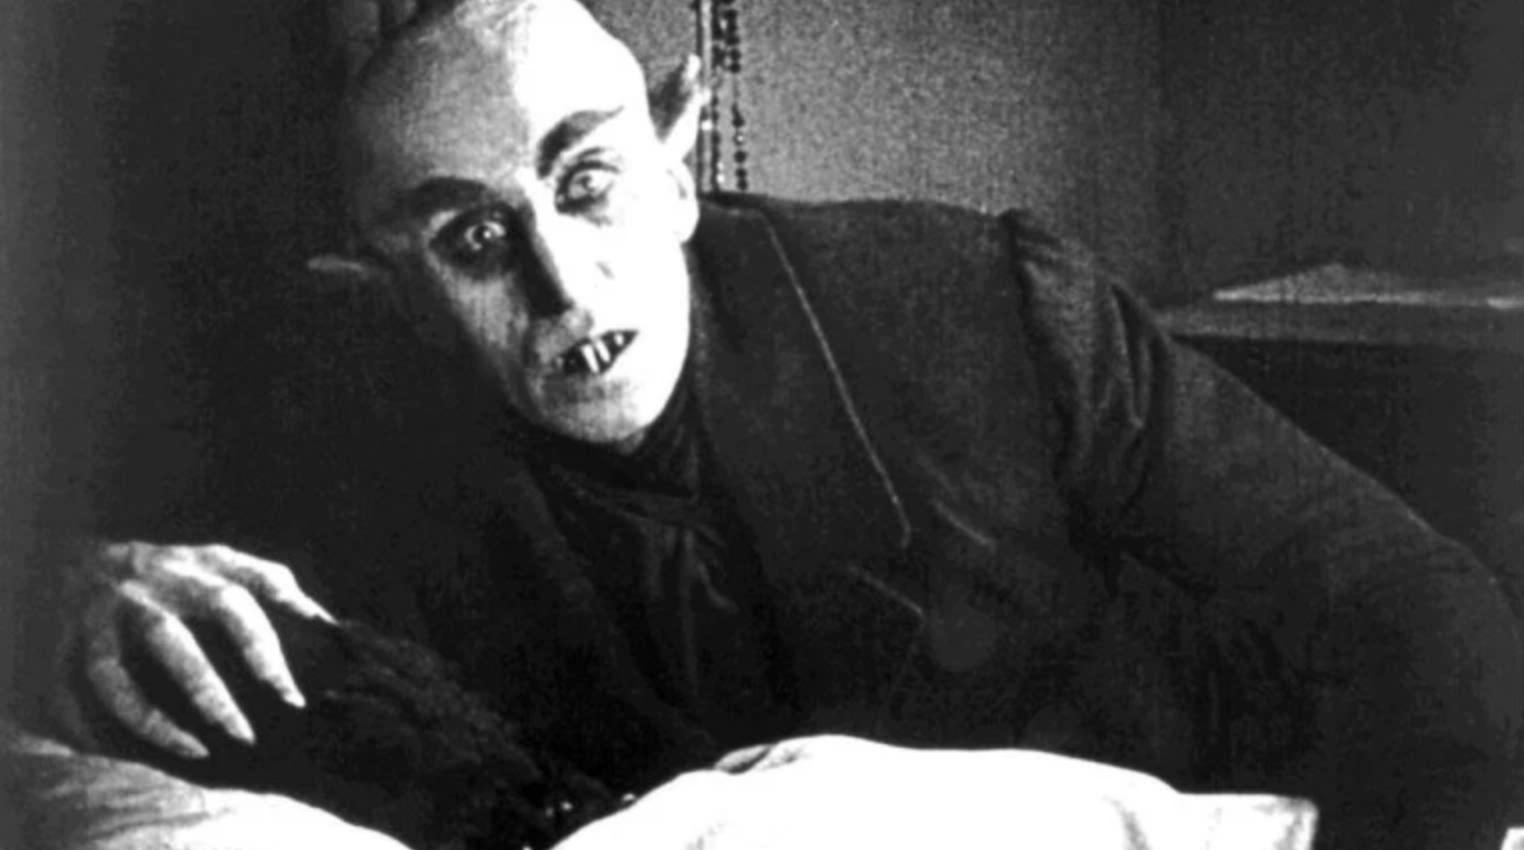 *Count Orlok in Nosferatu* (1922)